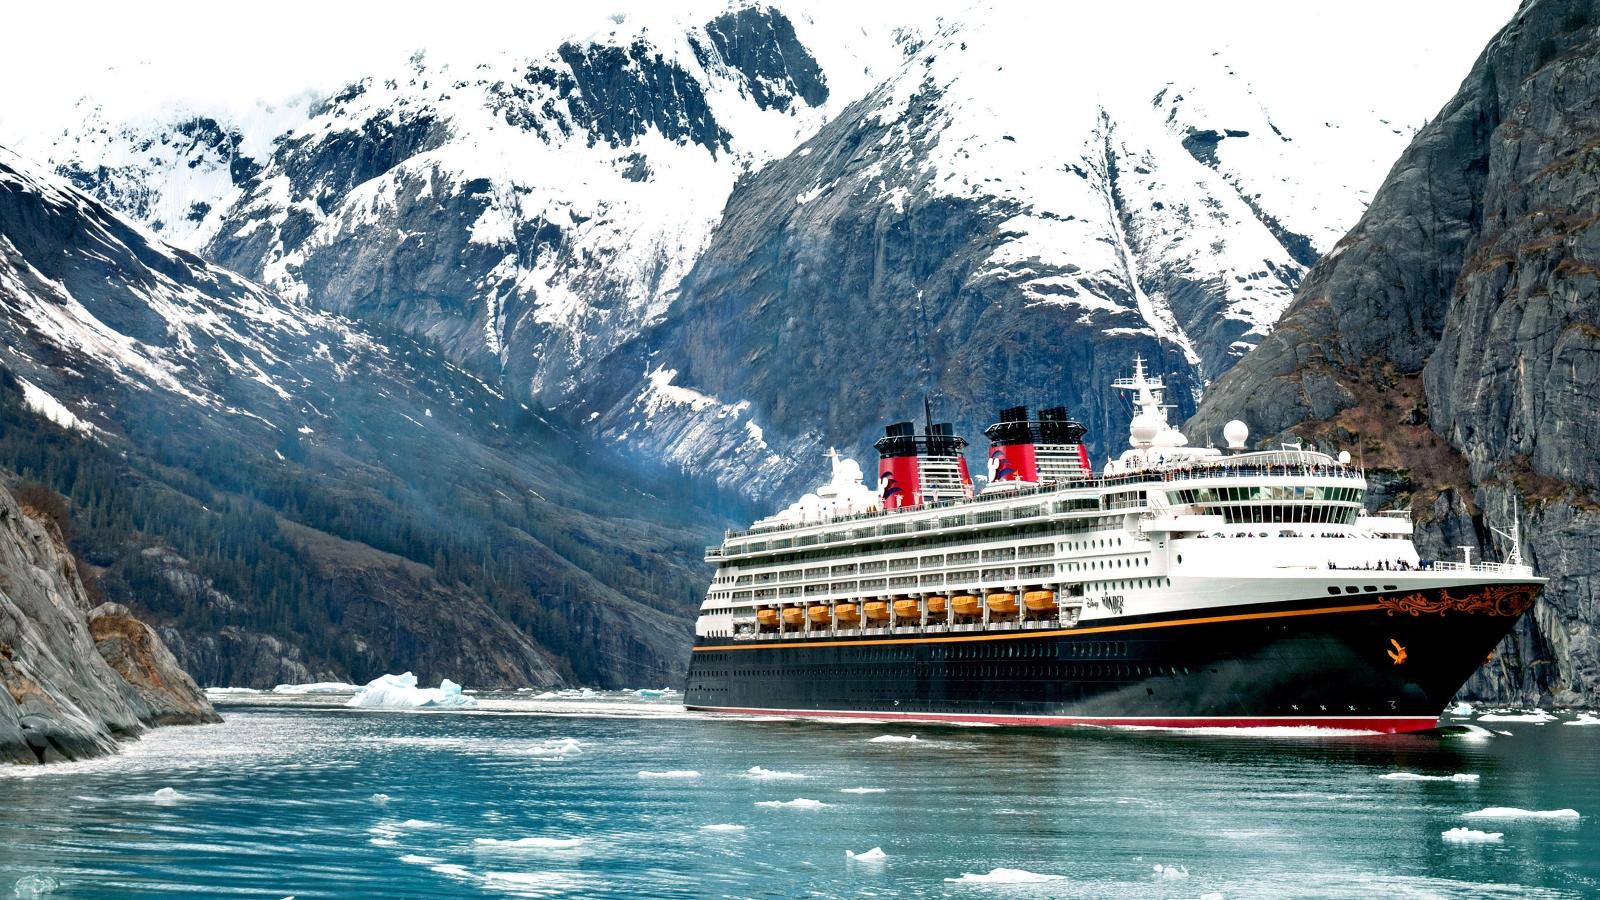 Disney cruise line unveils new itineraries for summer 2017 dizradio